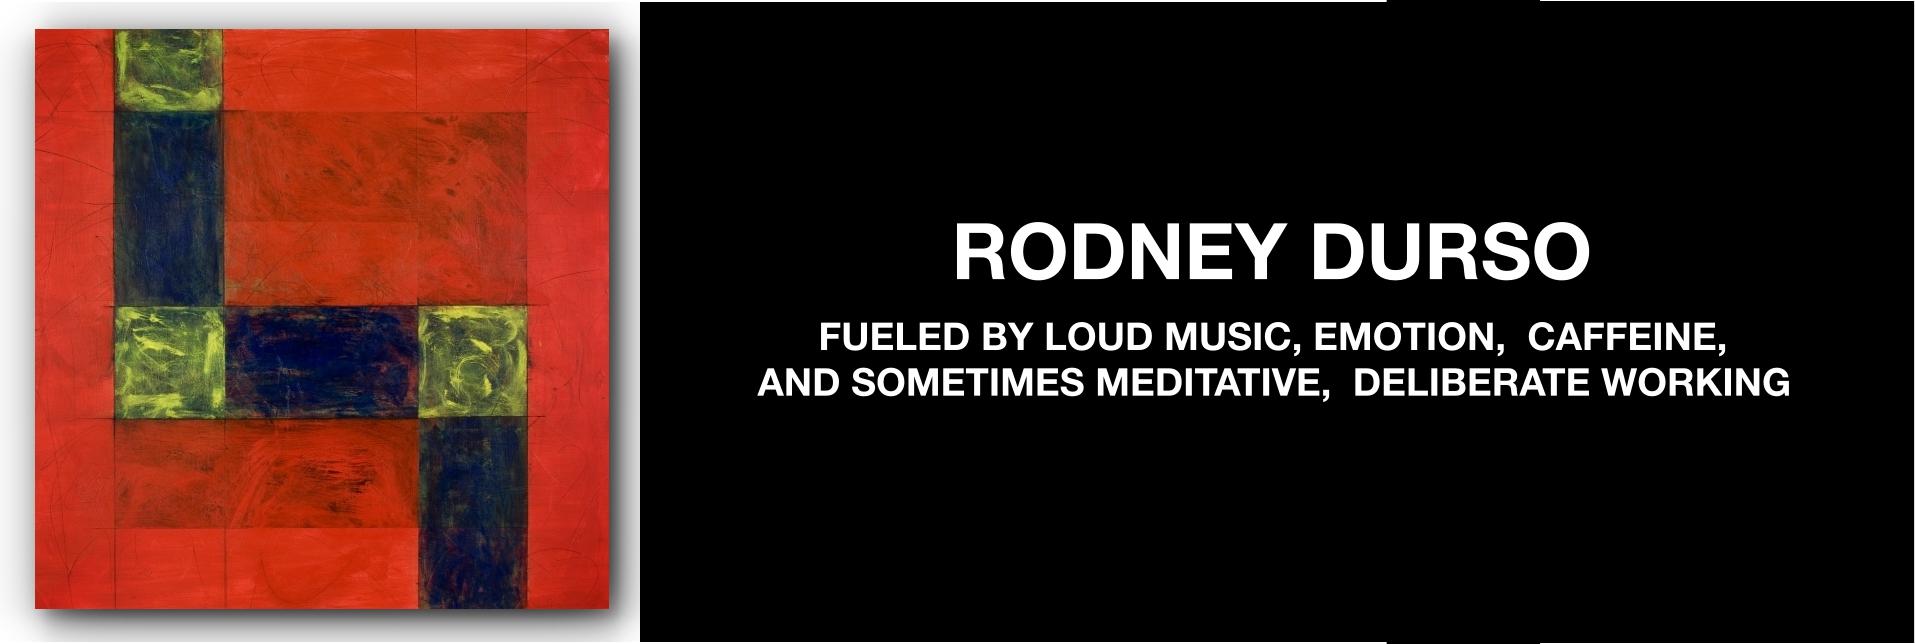 Rodney Durso - with wording.jpg